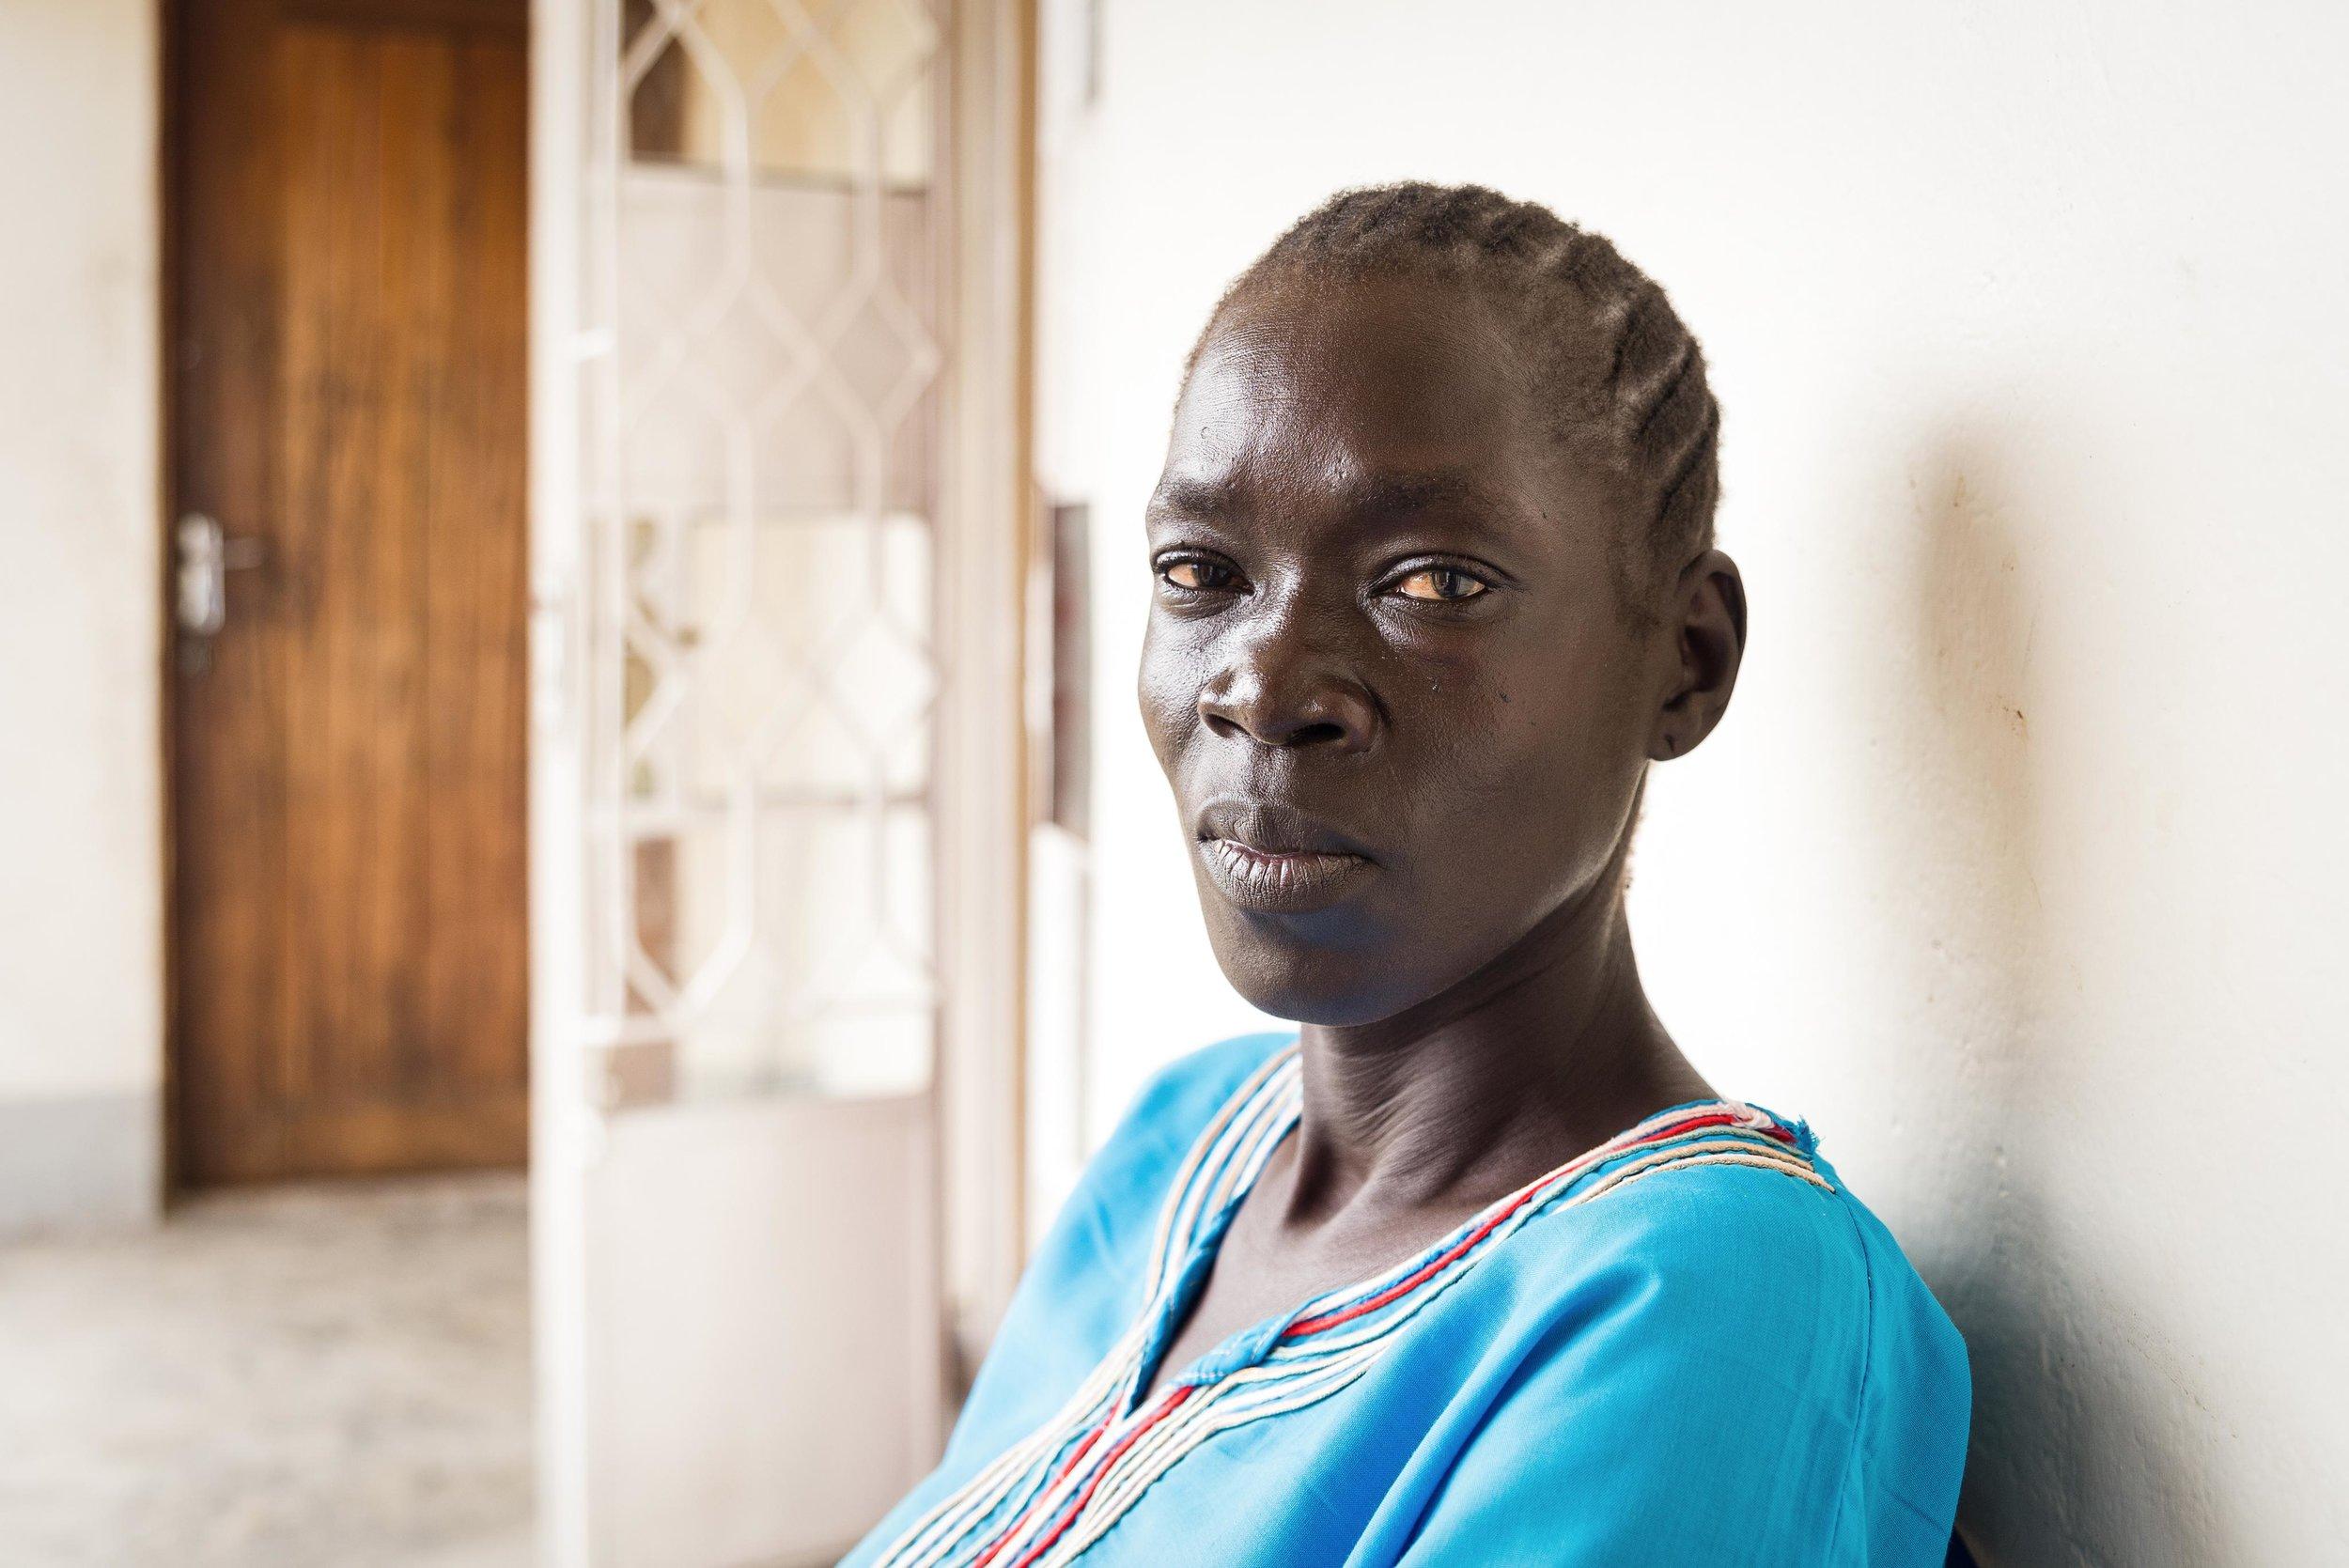 Wilma, 37, fled to Uganda three years ago.